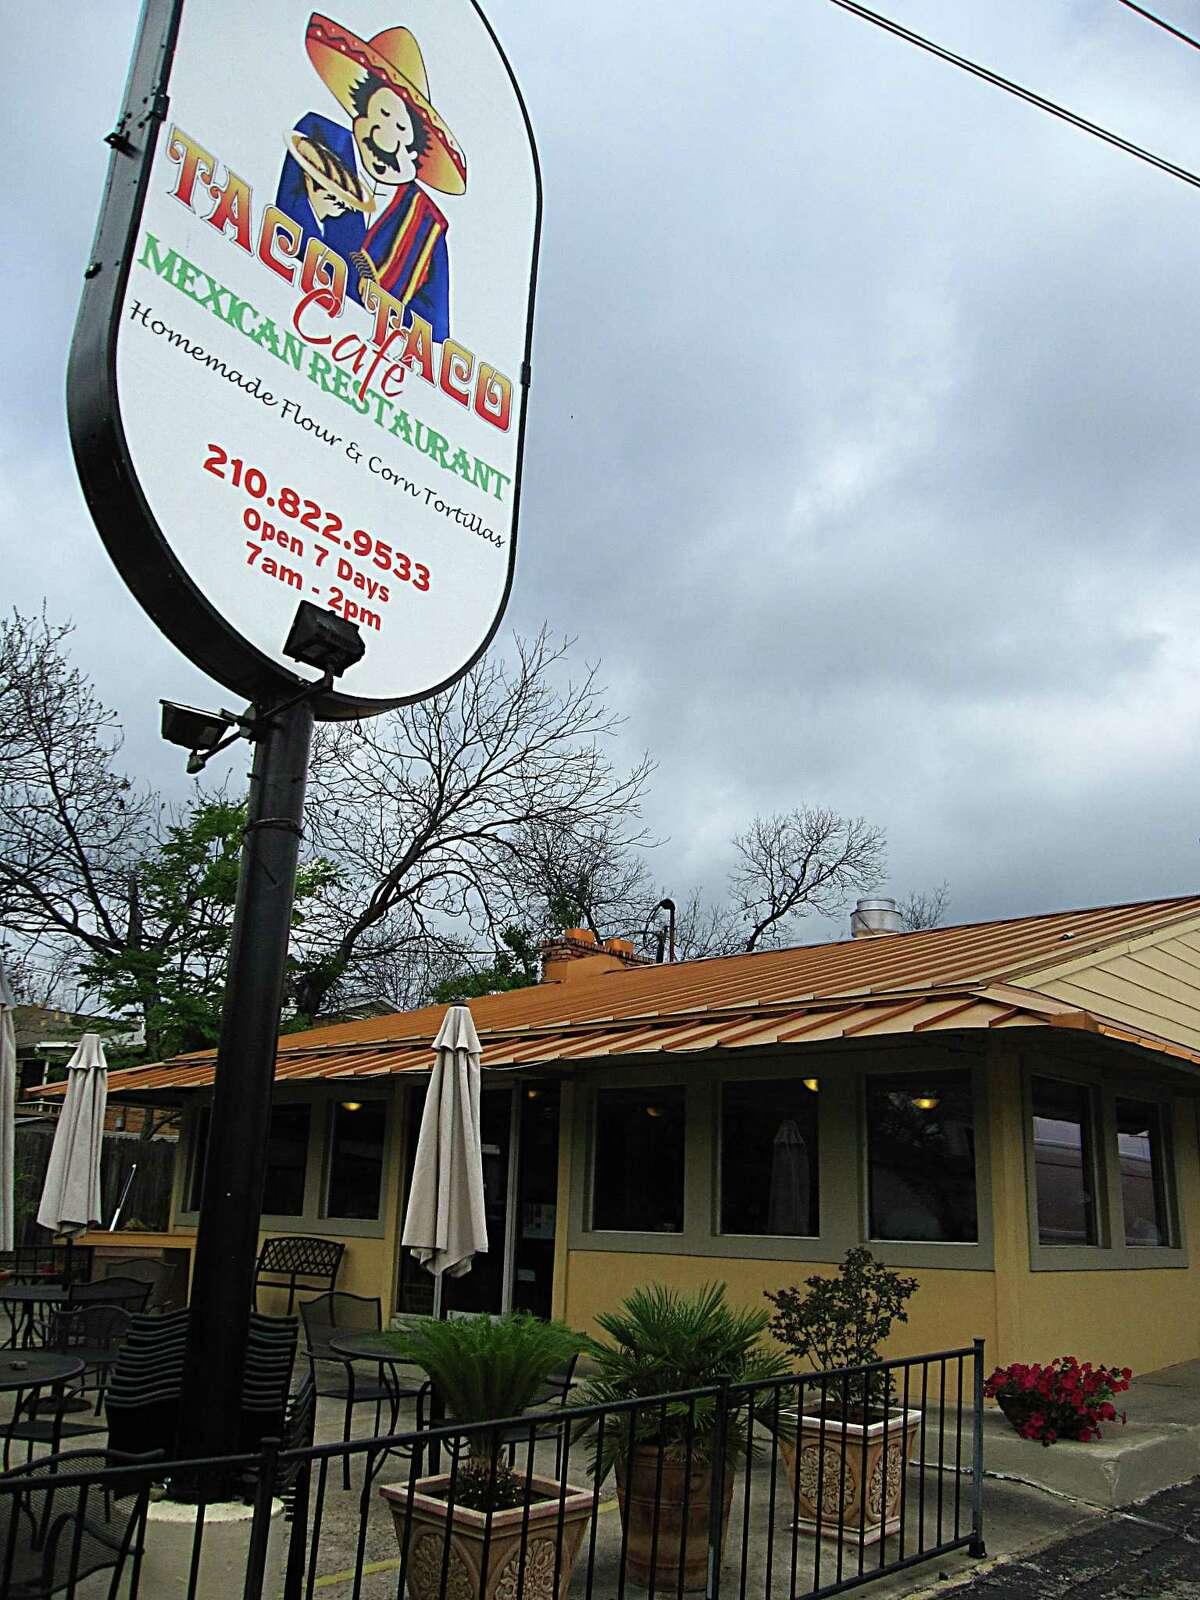 Taco Taco Cafe: 145 East Hildebrand Ave. Date: 07/15/2019 Score: 76 Highlights: Inspectors observed